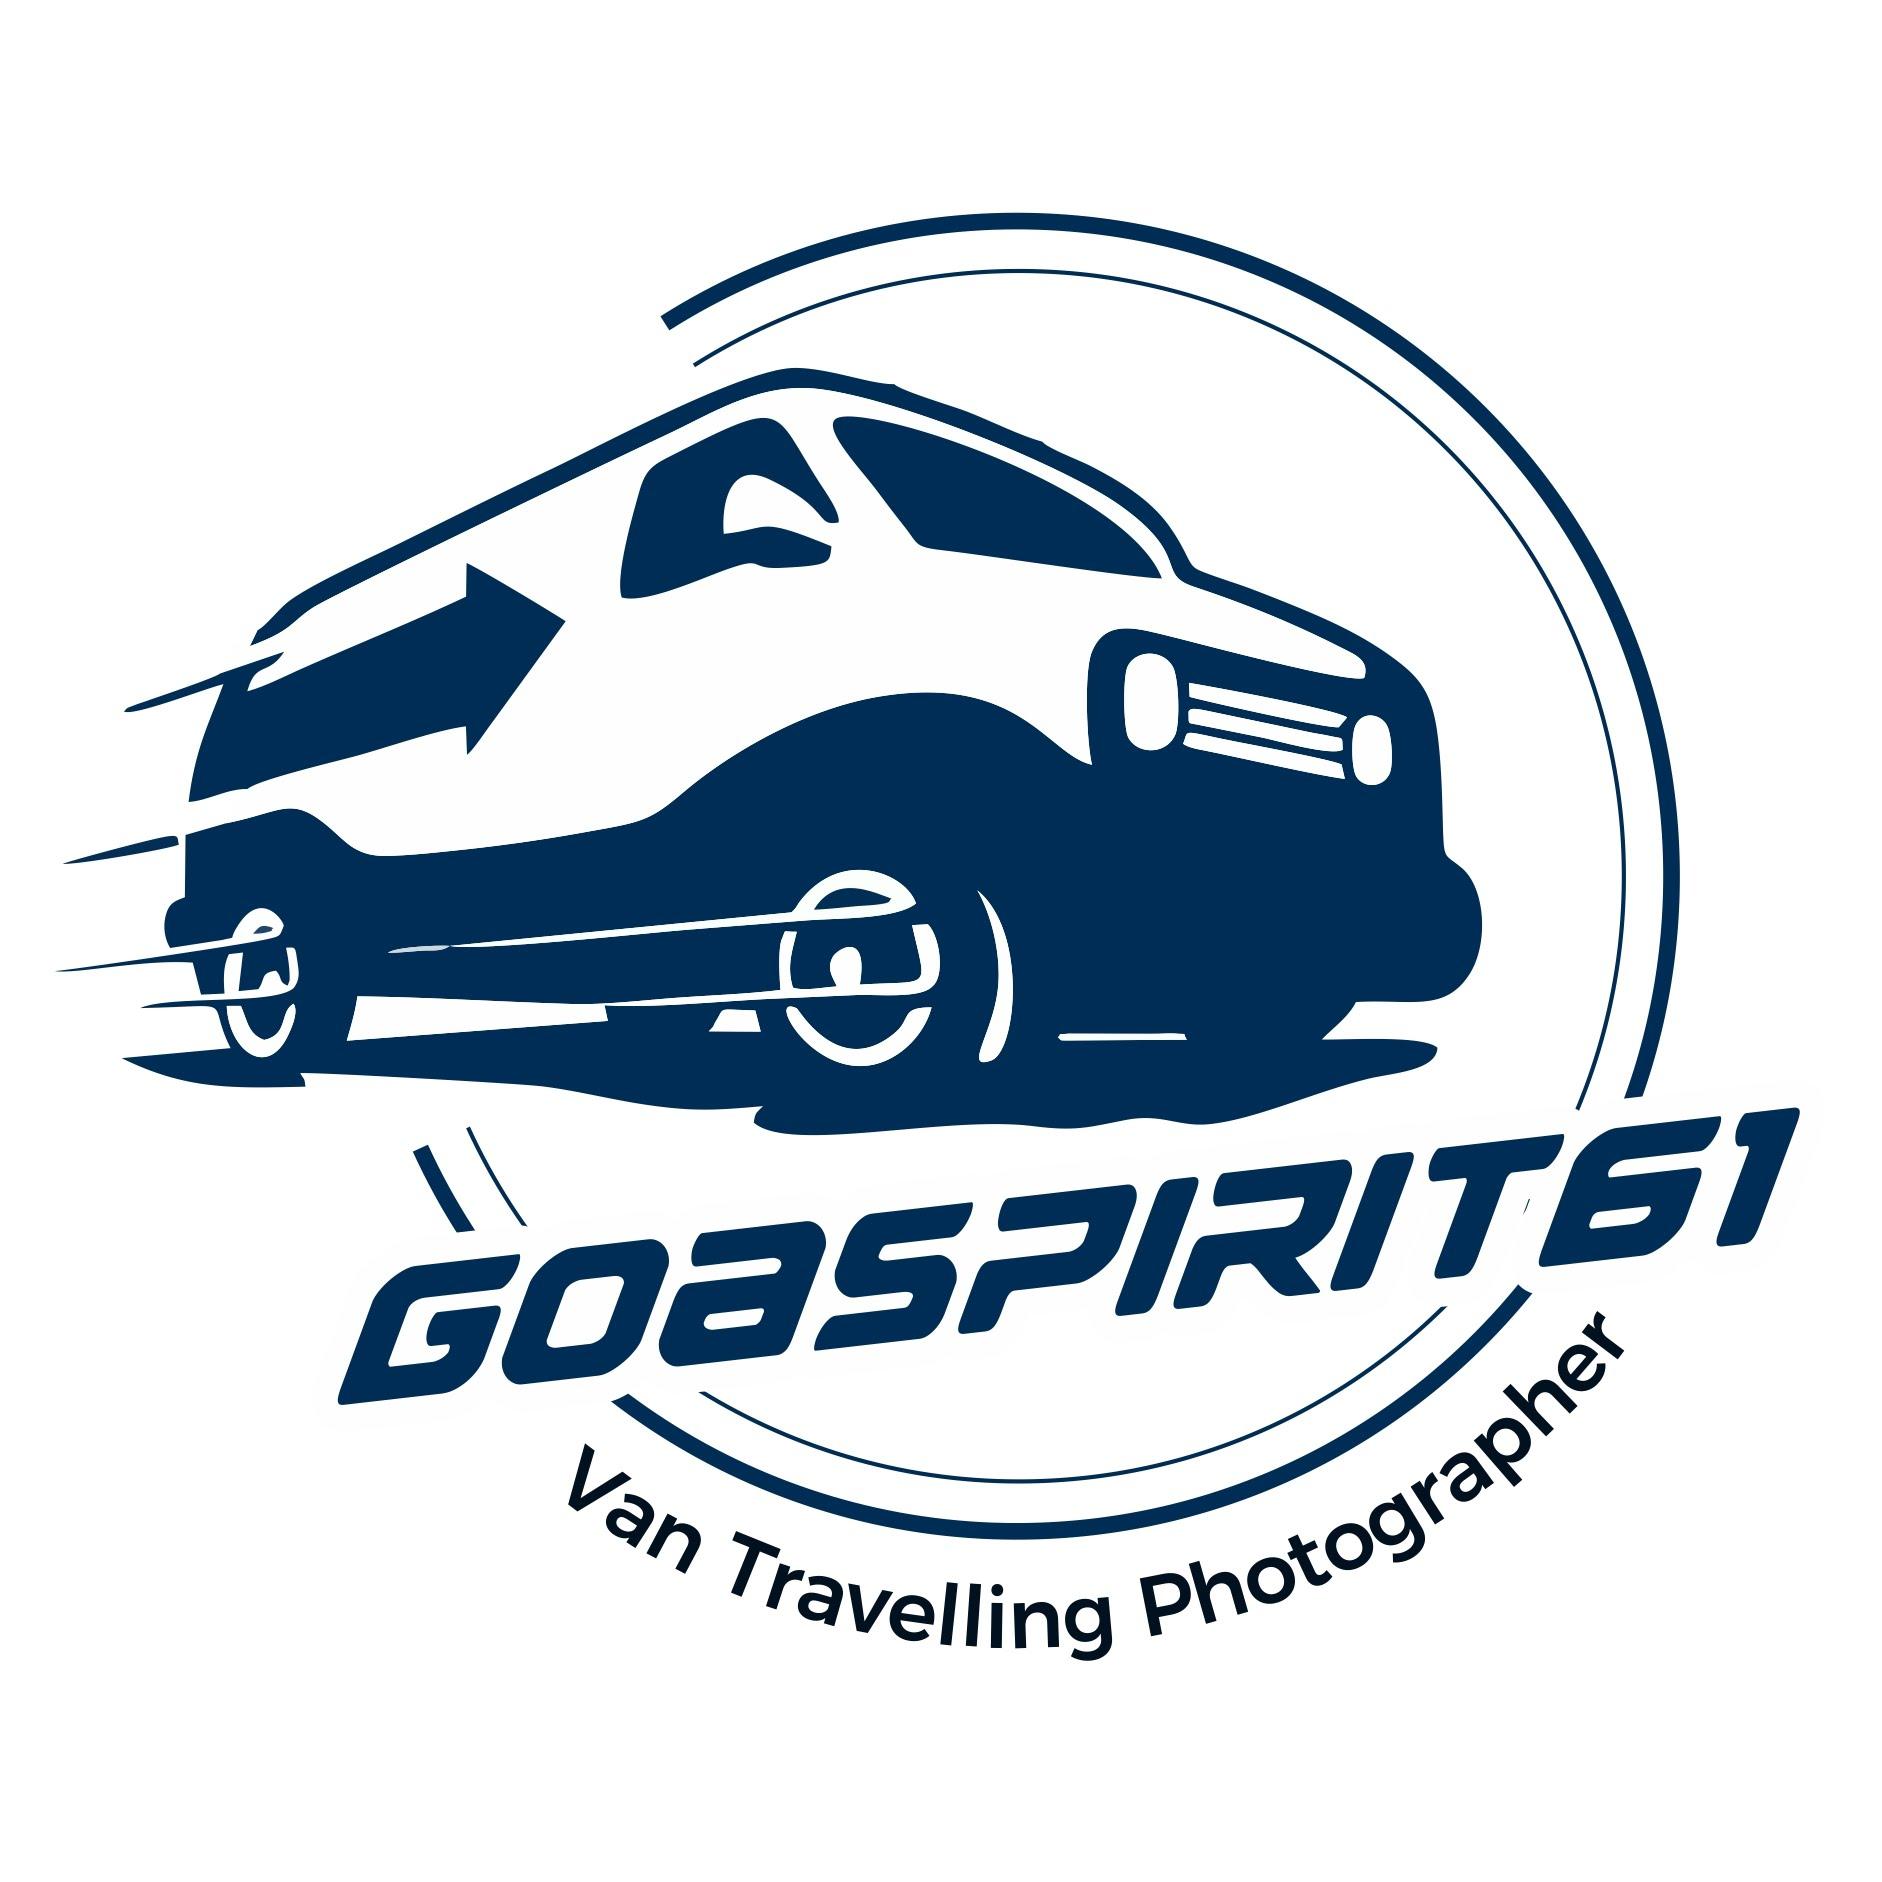 Goaspirit61 Van Travels & Photography